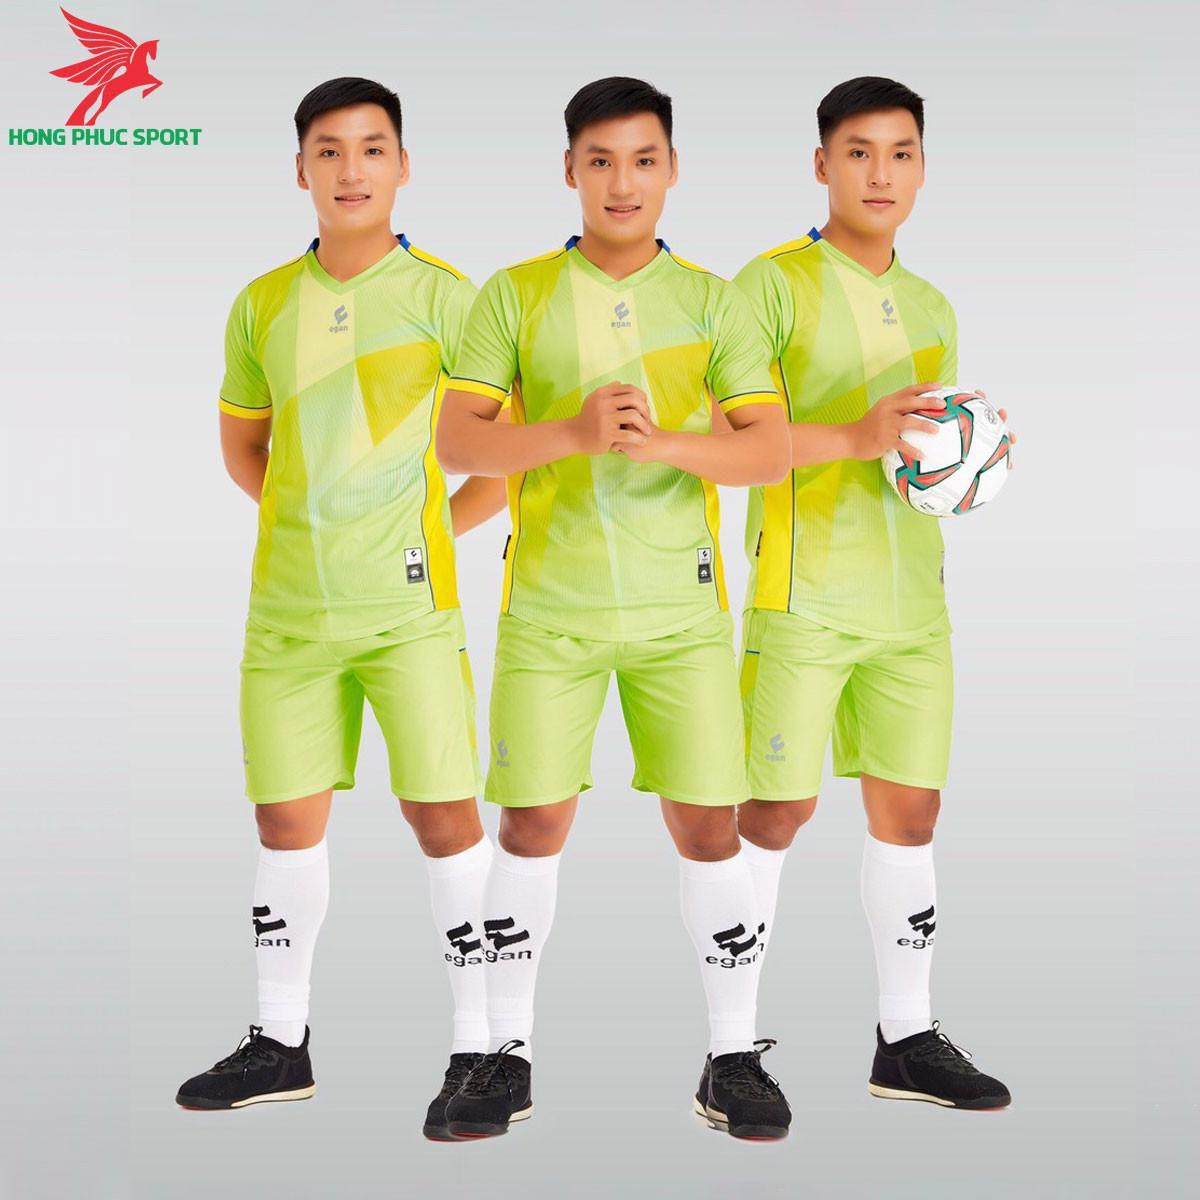 https://cdn.hongphucsport.com/unsafe/s4.shopbay.vn/files/285/ao-da-bong-khong-logo-egan-victory-mau-xanh-chuoi-6050864e6fa44.jpg